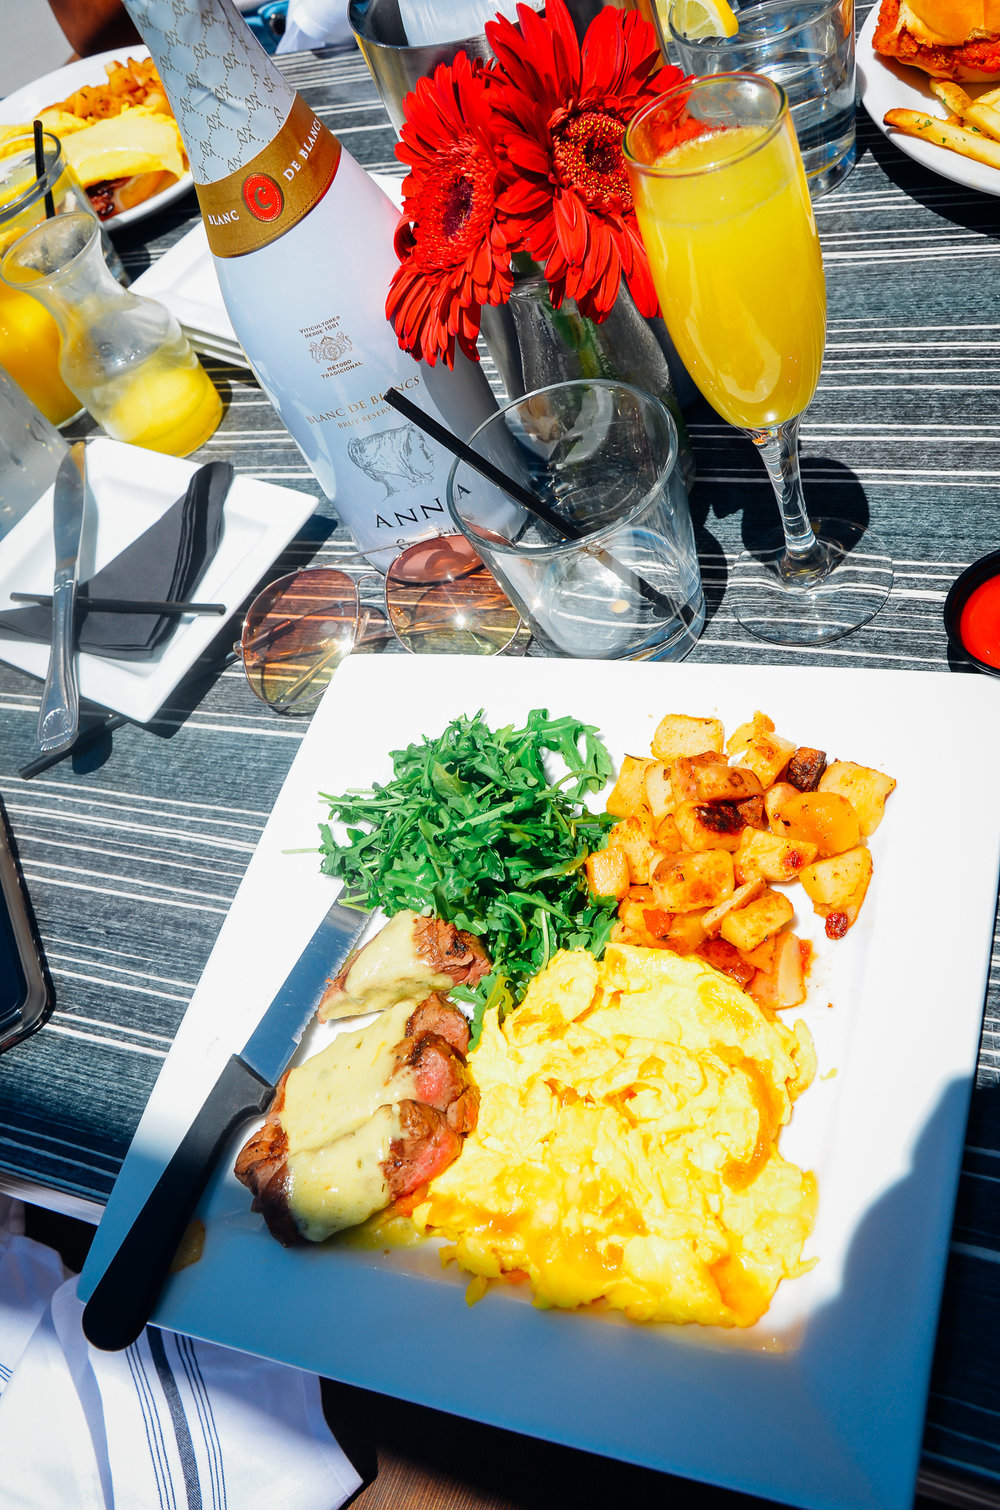 Steak, Eggs, and House Potatoes.